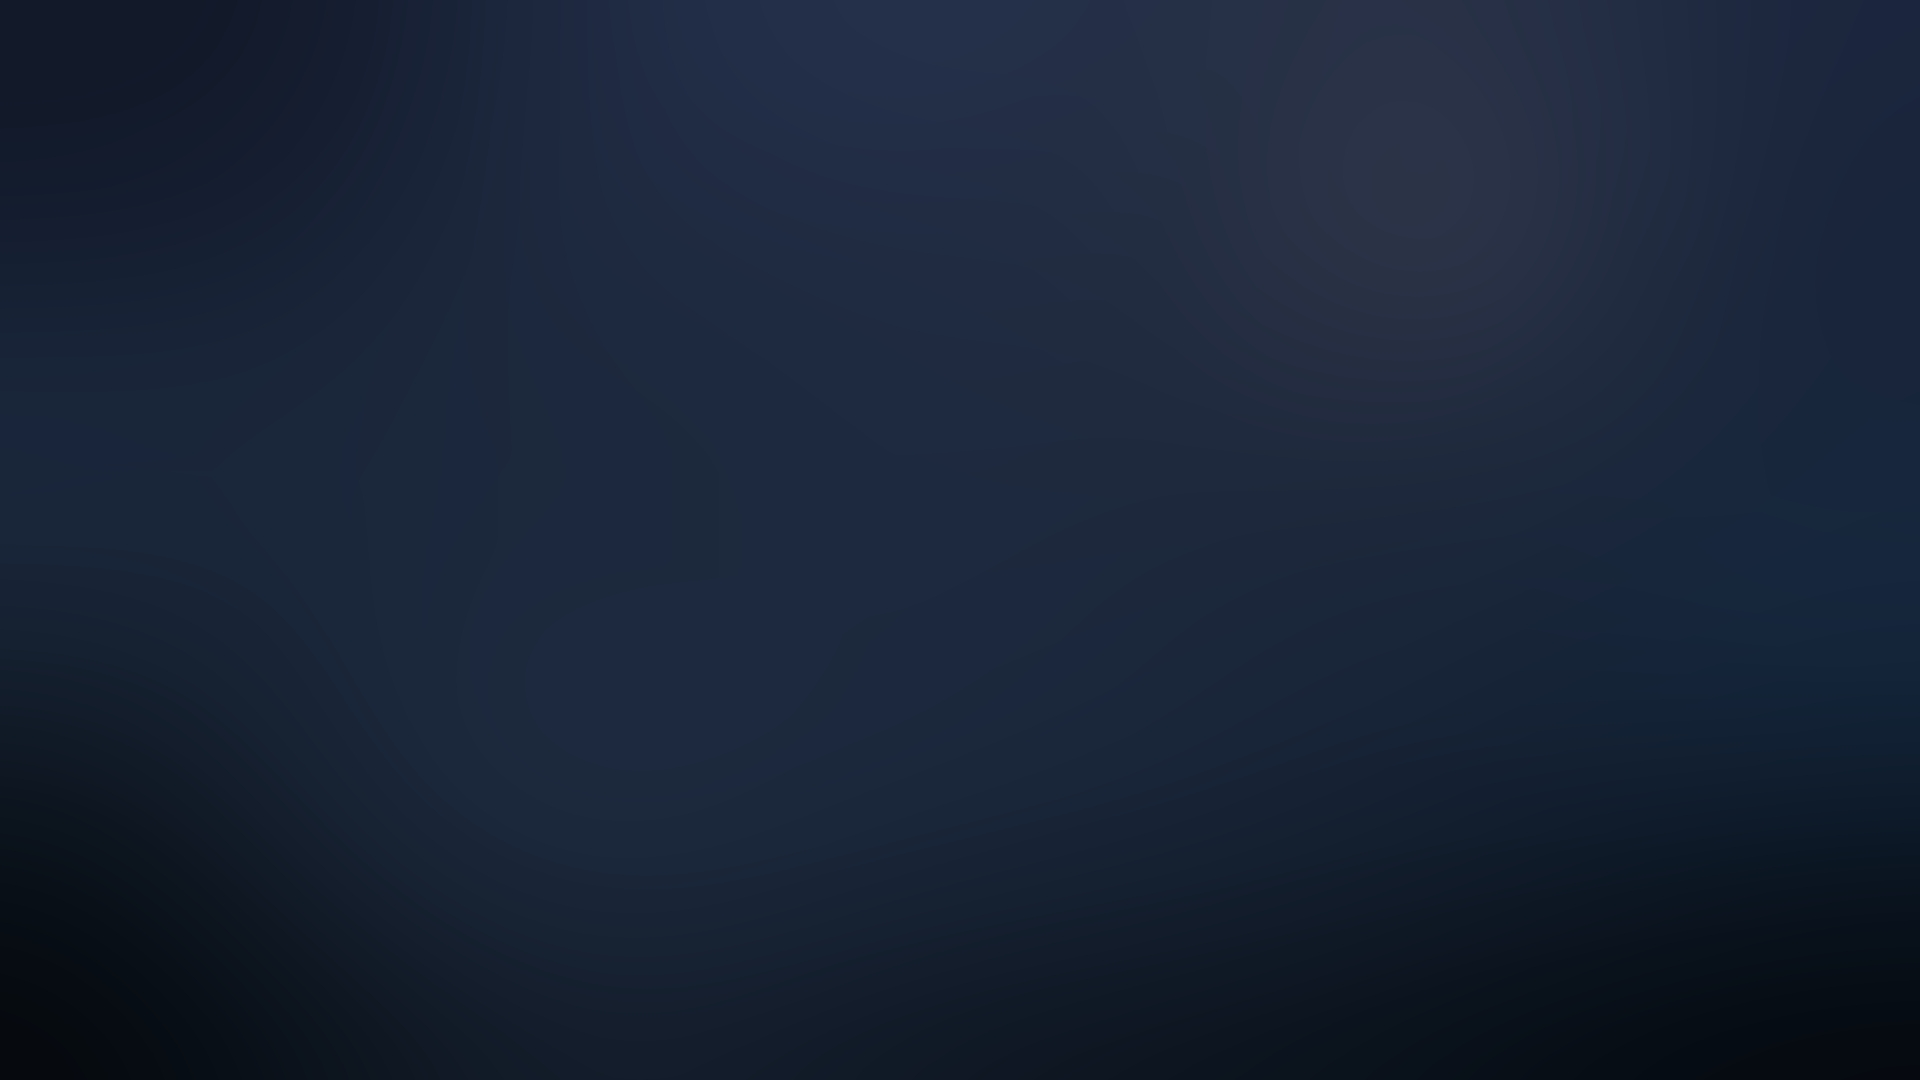 dark-blue-gradient-wallpaper-396-445-hd-wallpapers | visual litigation